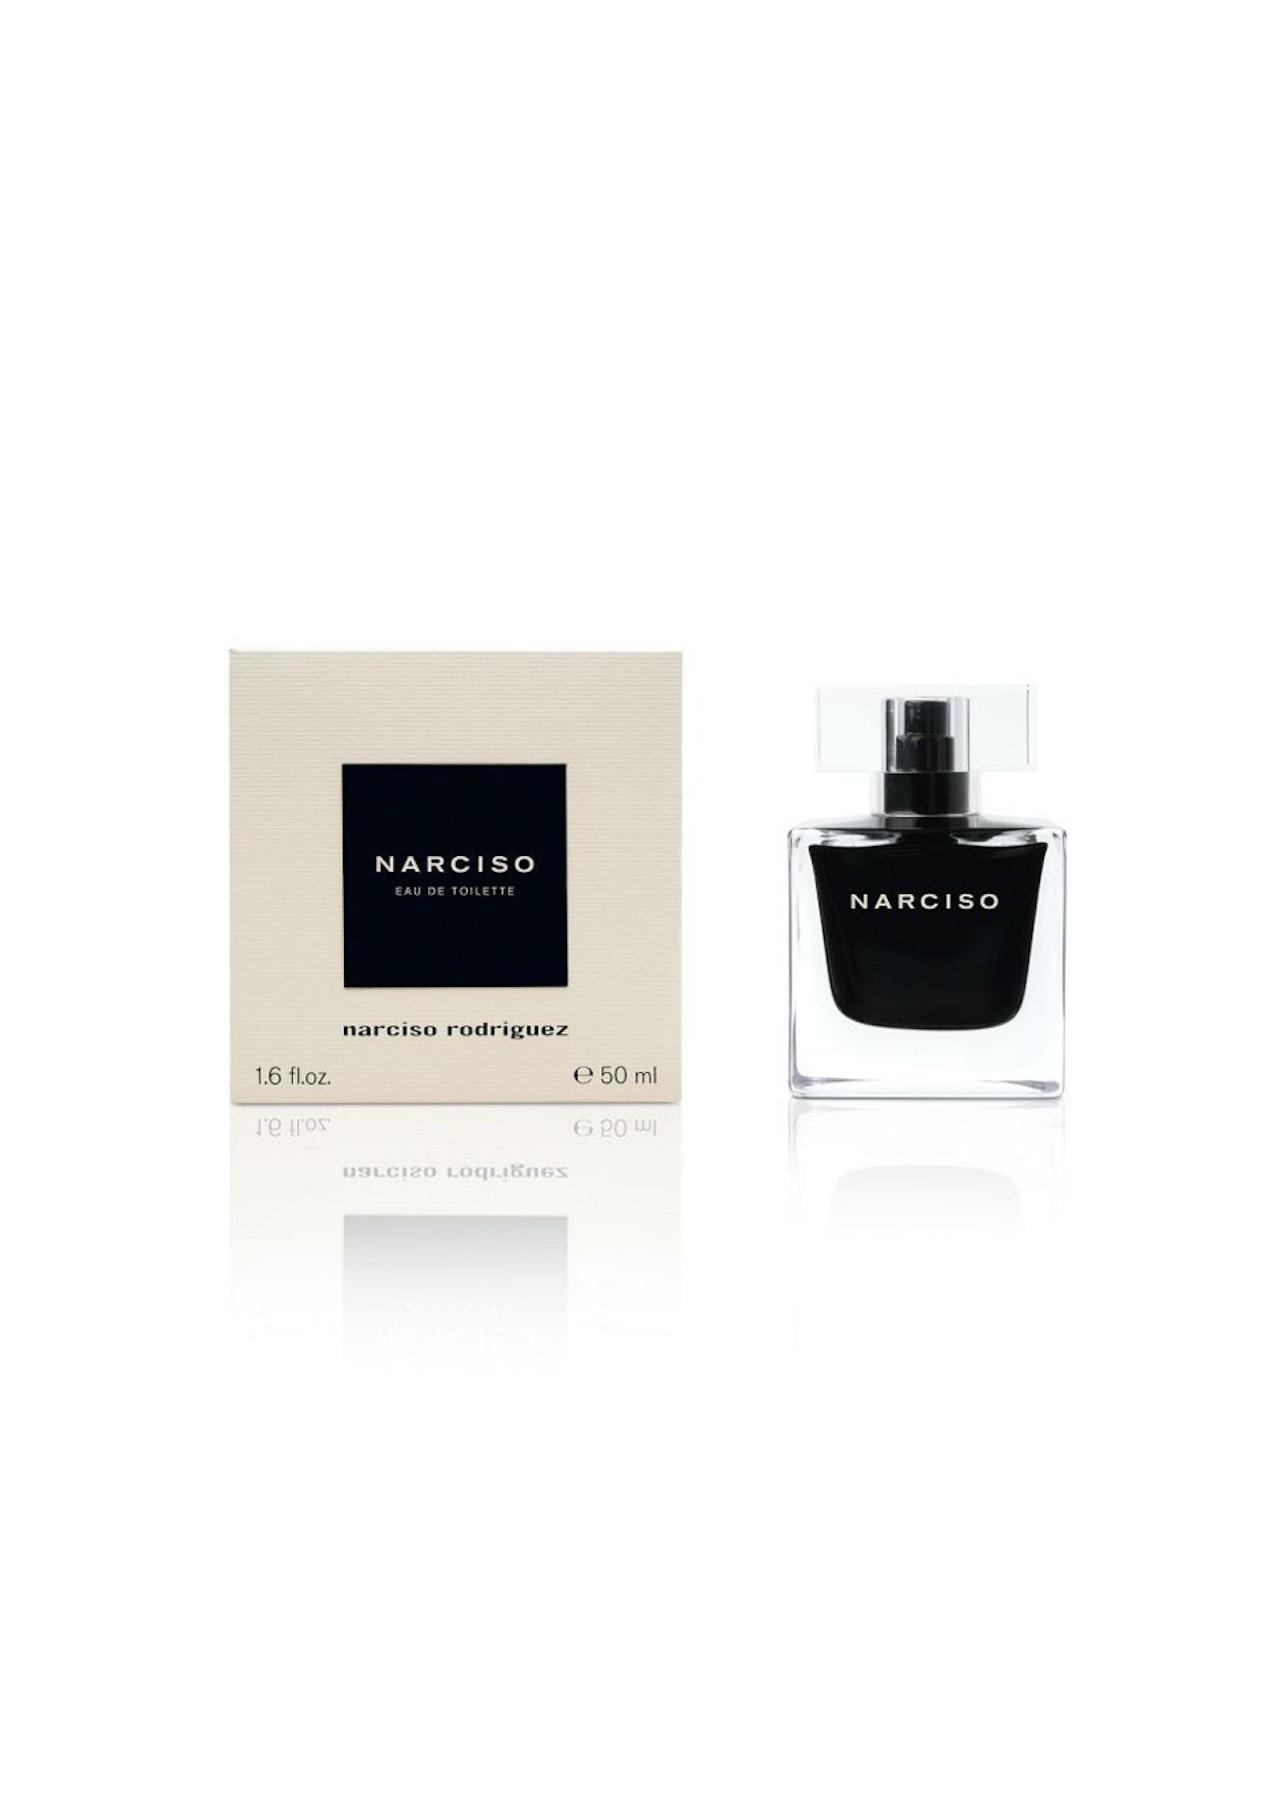 51e9973ba43 Narciso Rodriguez Narciso Eau De Toilette 50ml - Designer Fragrance - Onceit